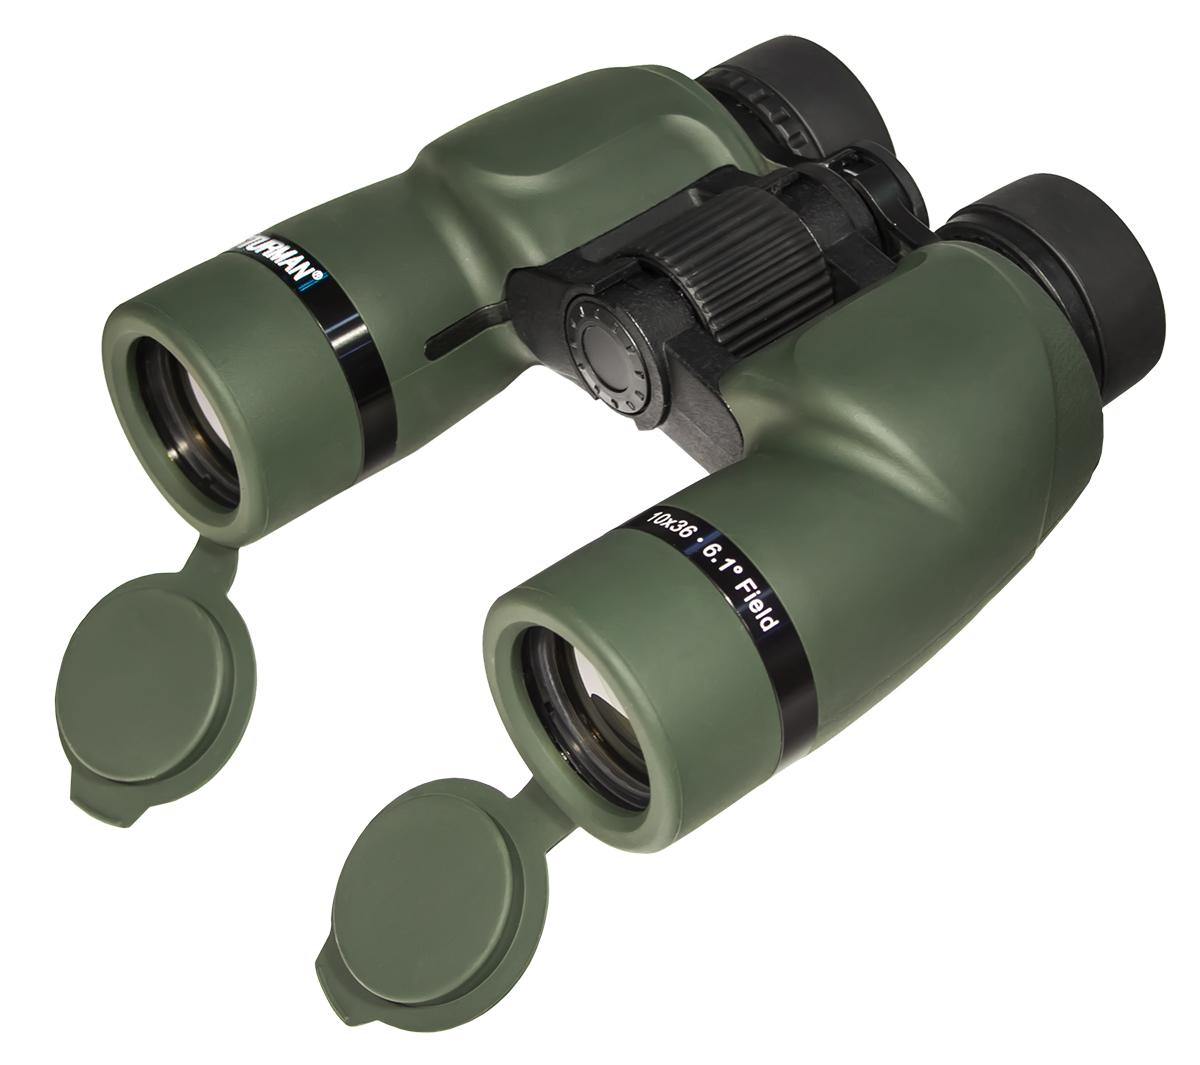 Бинокль Sturman, цвет: зеленый, увеличение 10х крат, диаметр объектива 36 мм